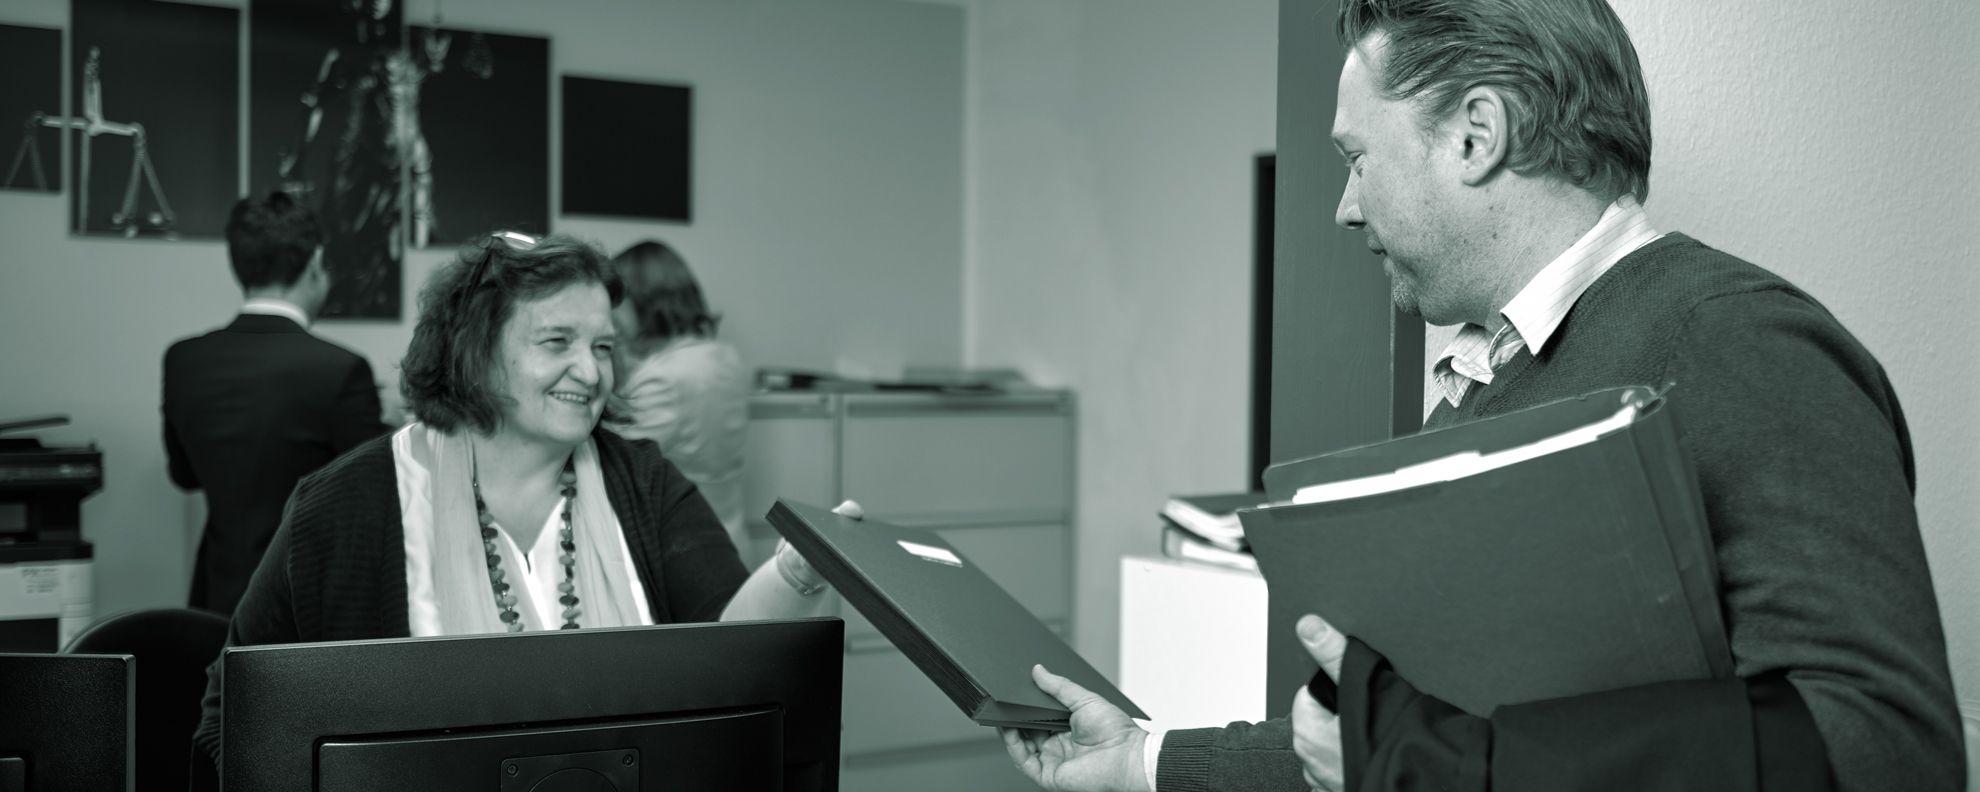 Krings, Krebs & Kollegen Rechtsanwälte | Kanzlei Heinsberg und Baesweiler